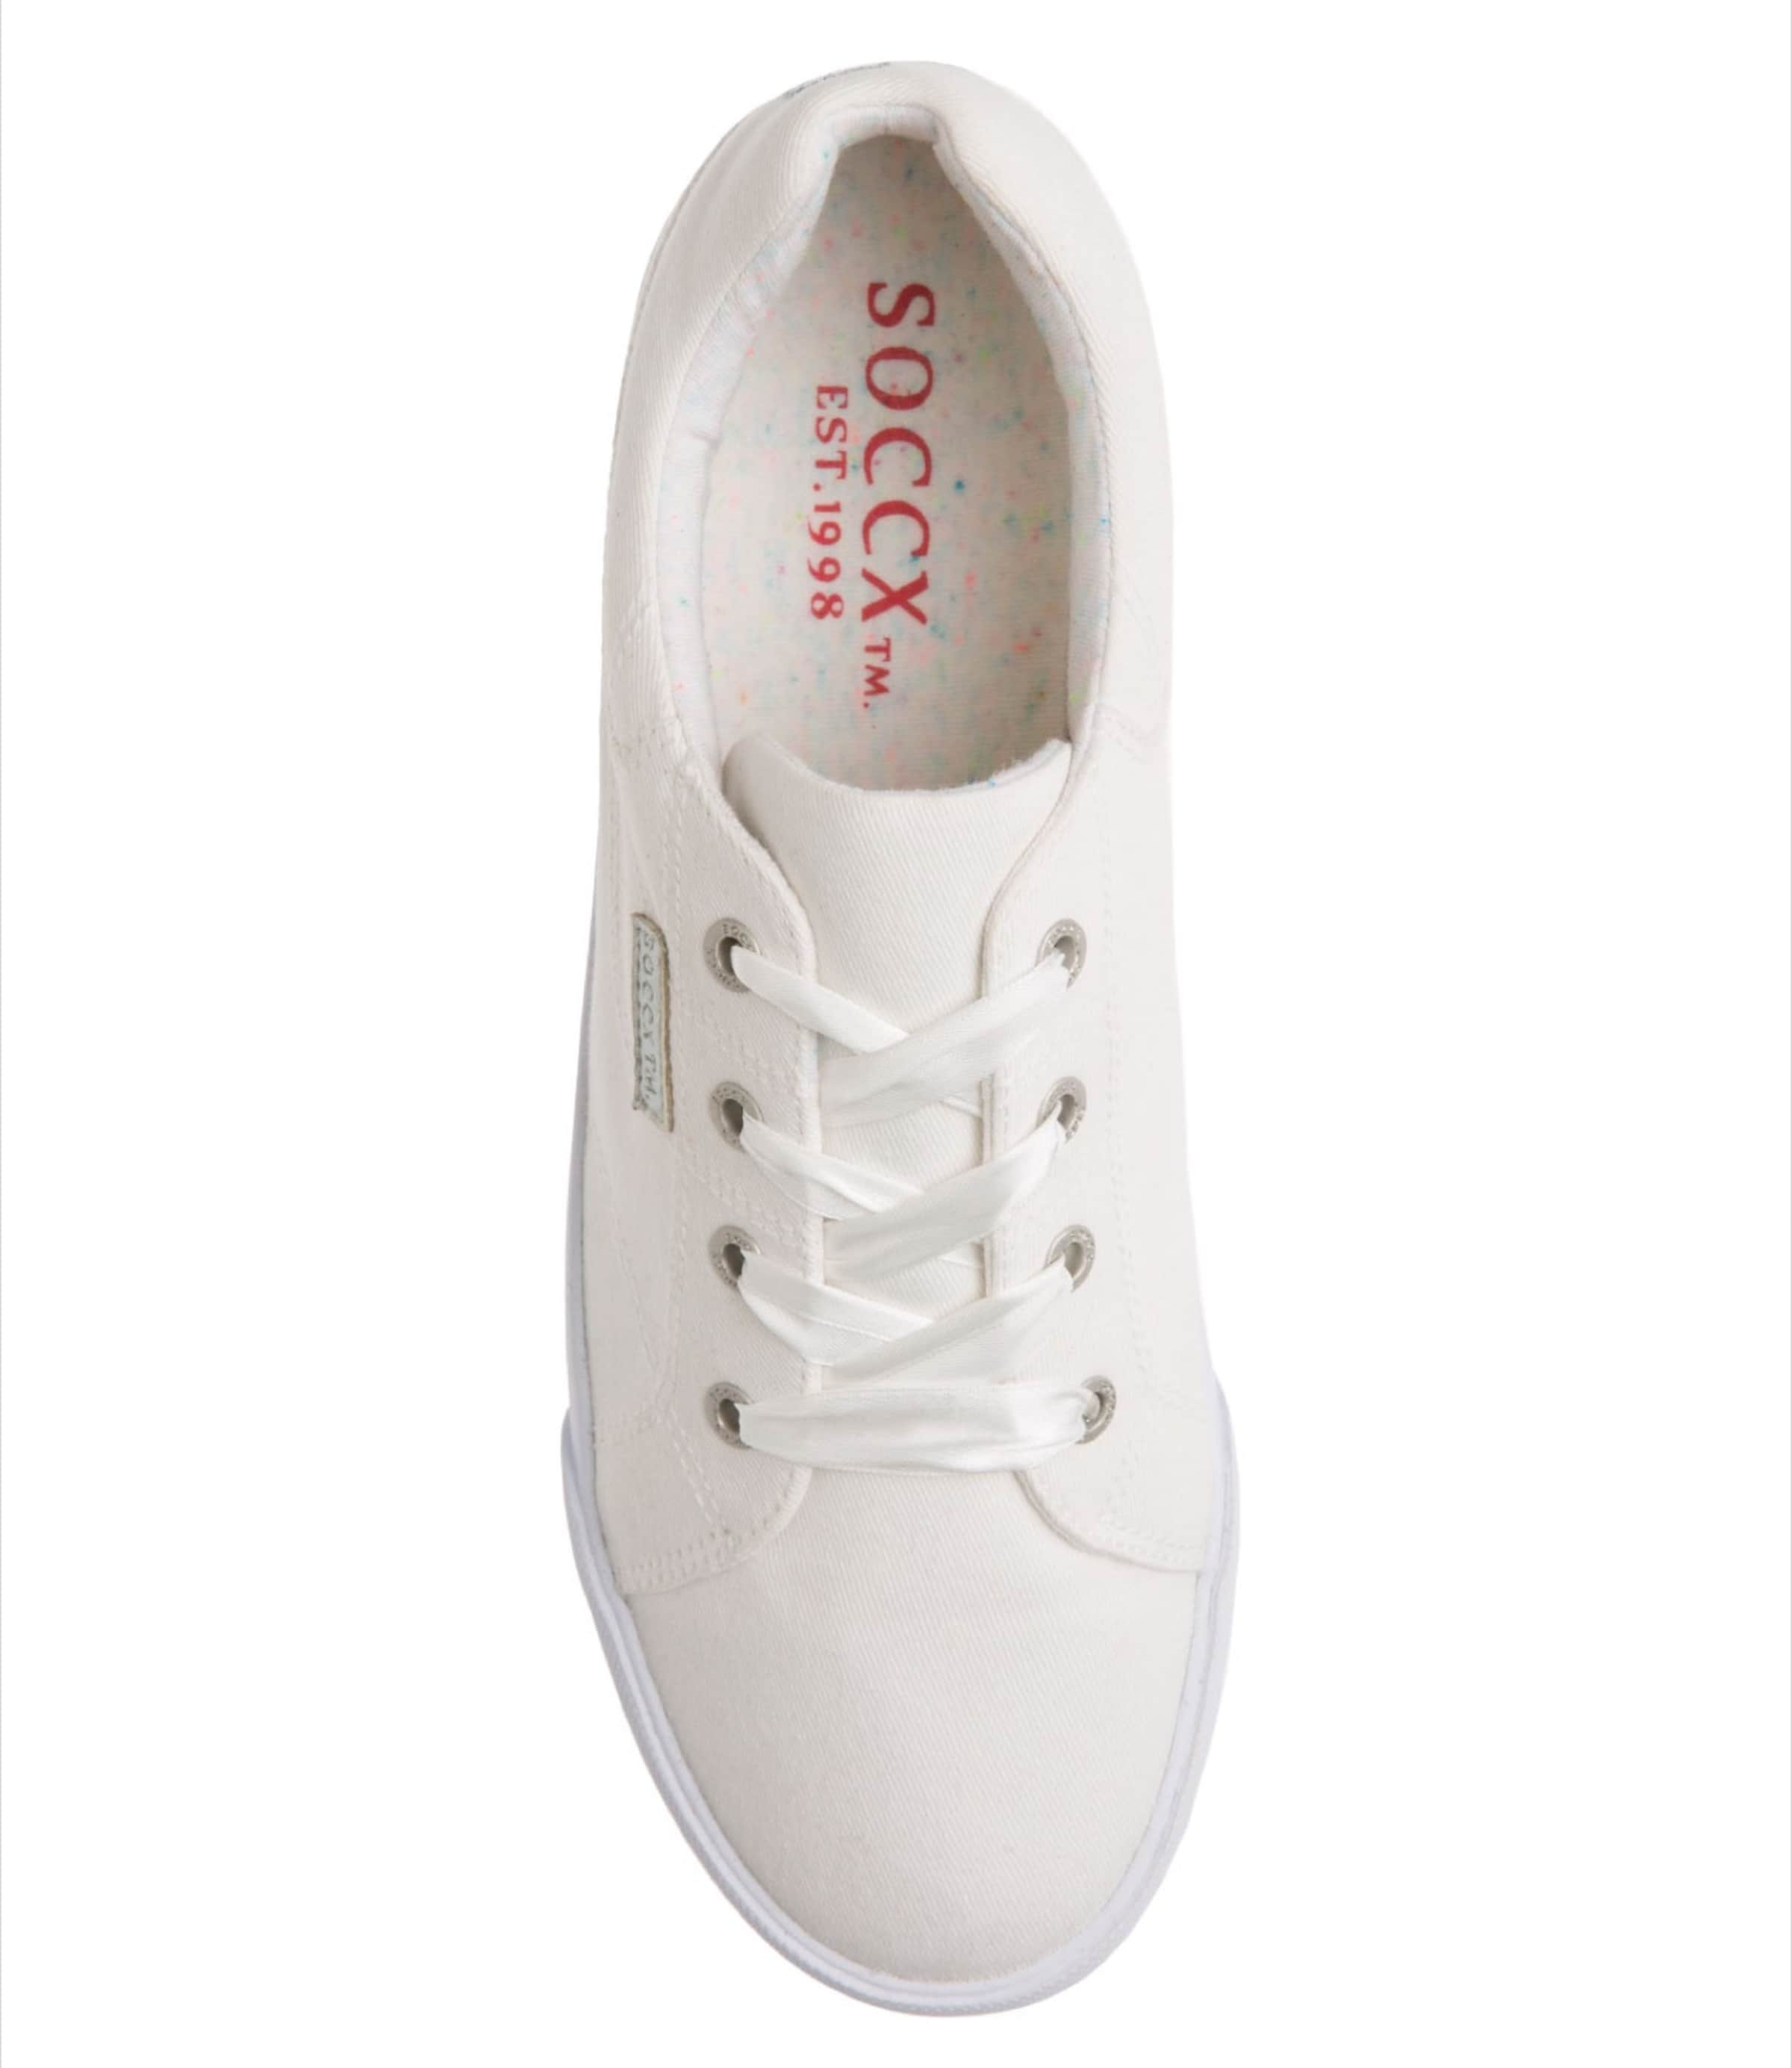 Sneaker In Weiß Soccx Sneaker In Weiß Weiß Soccx In Soccx Soccx Sneaker ulFT5K1c3J